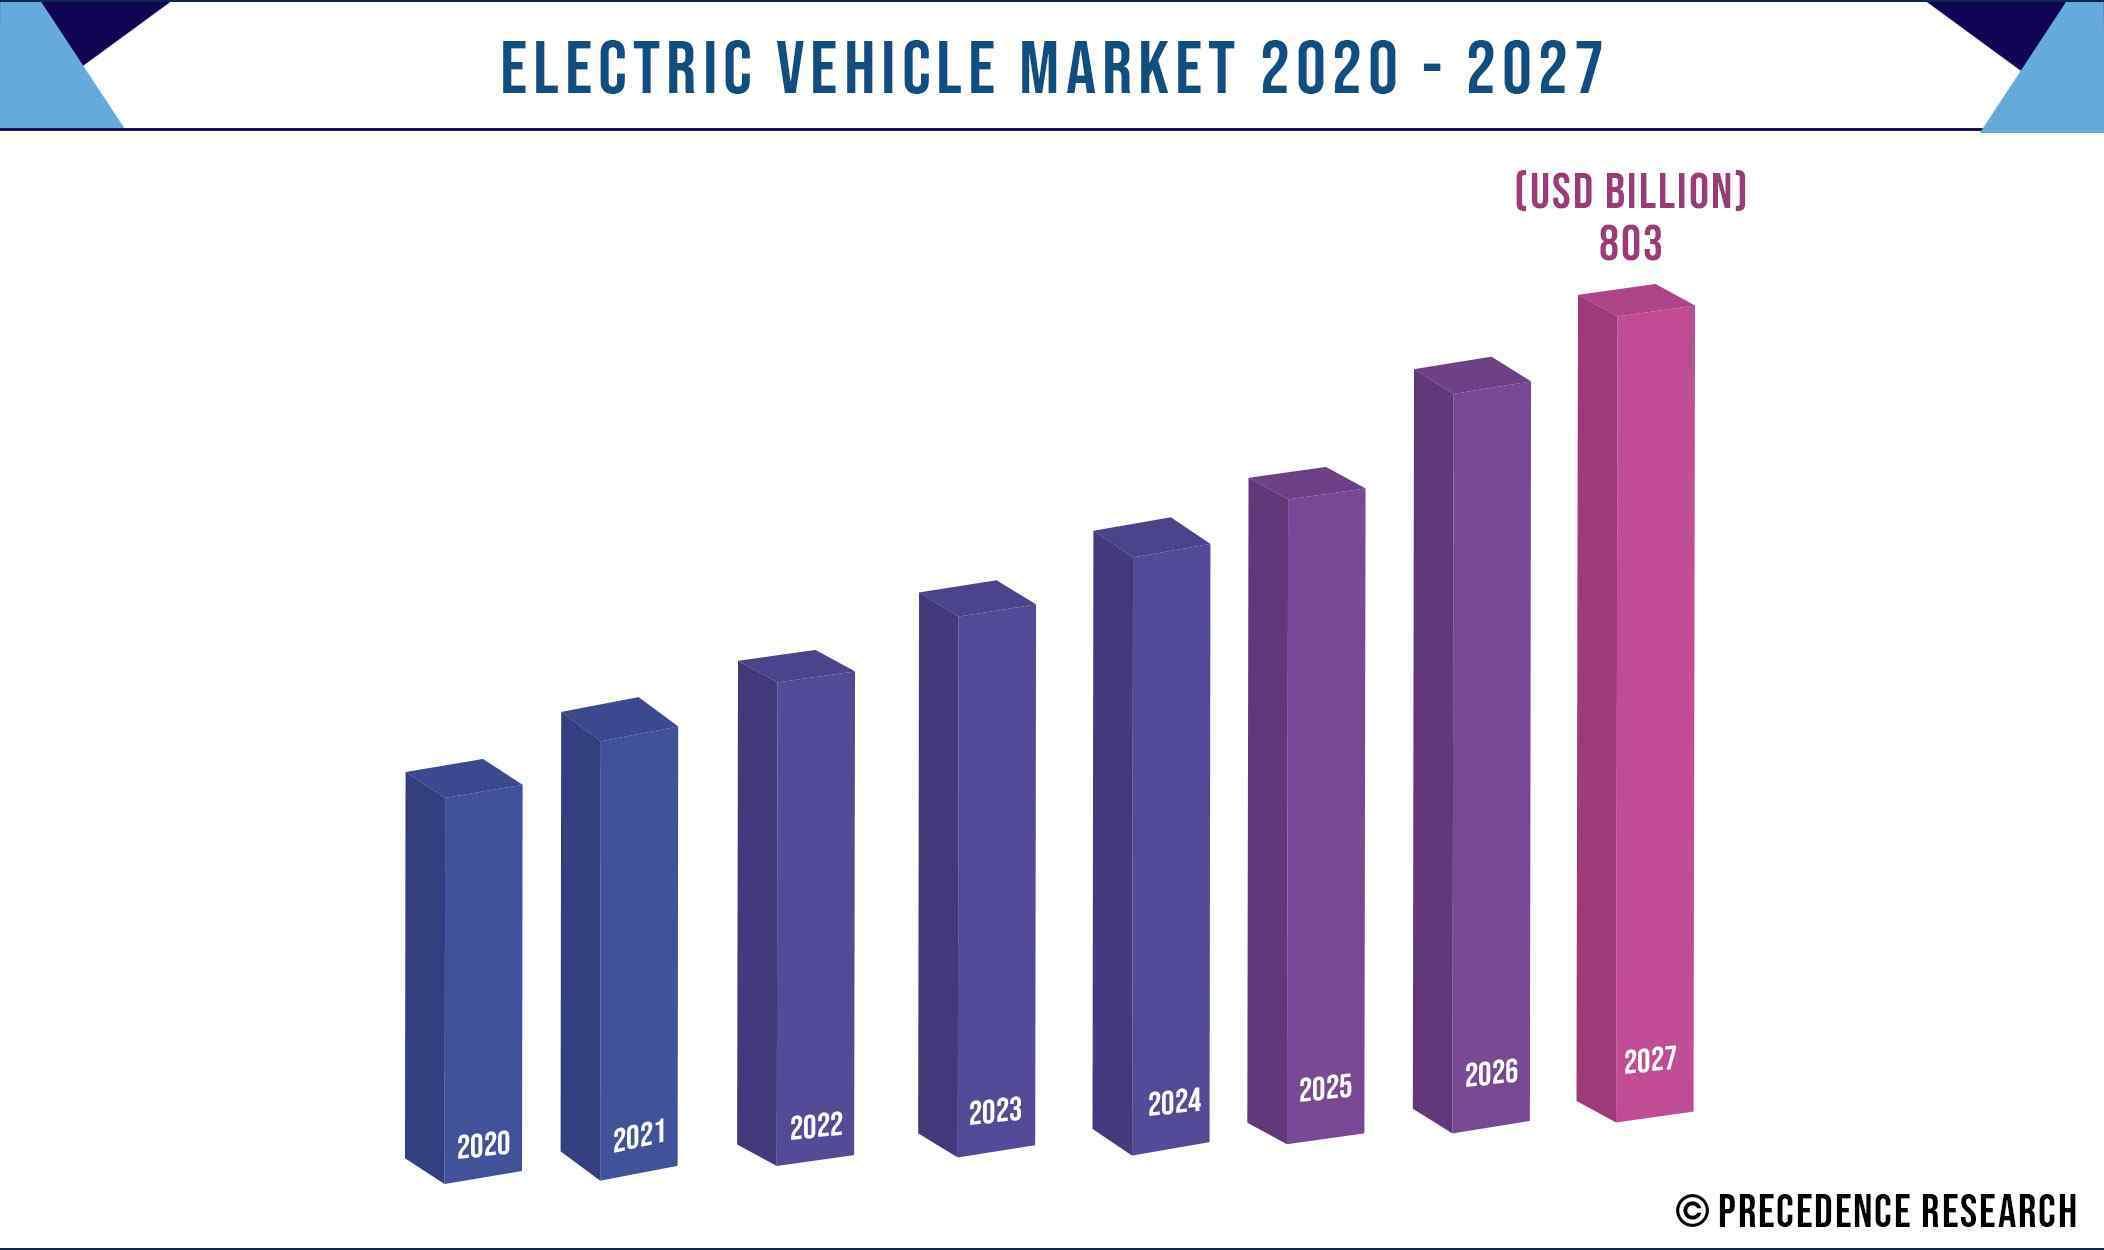 Electric Vehicle Market Size 2020-2027